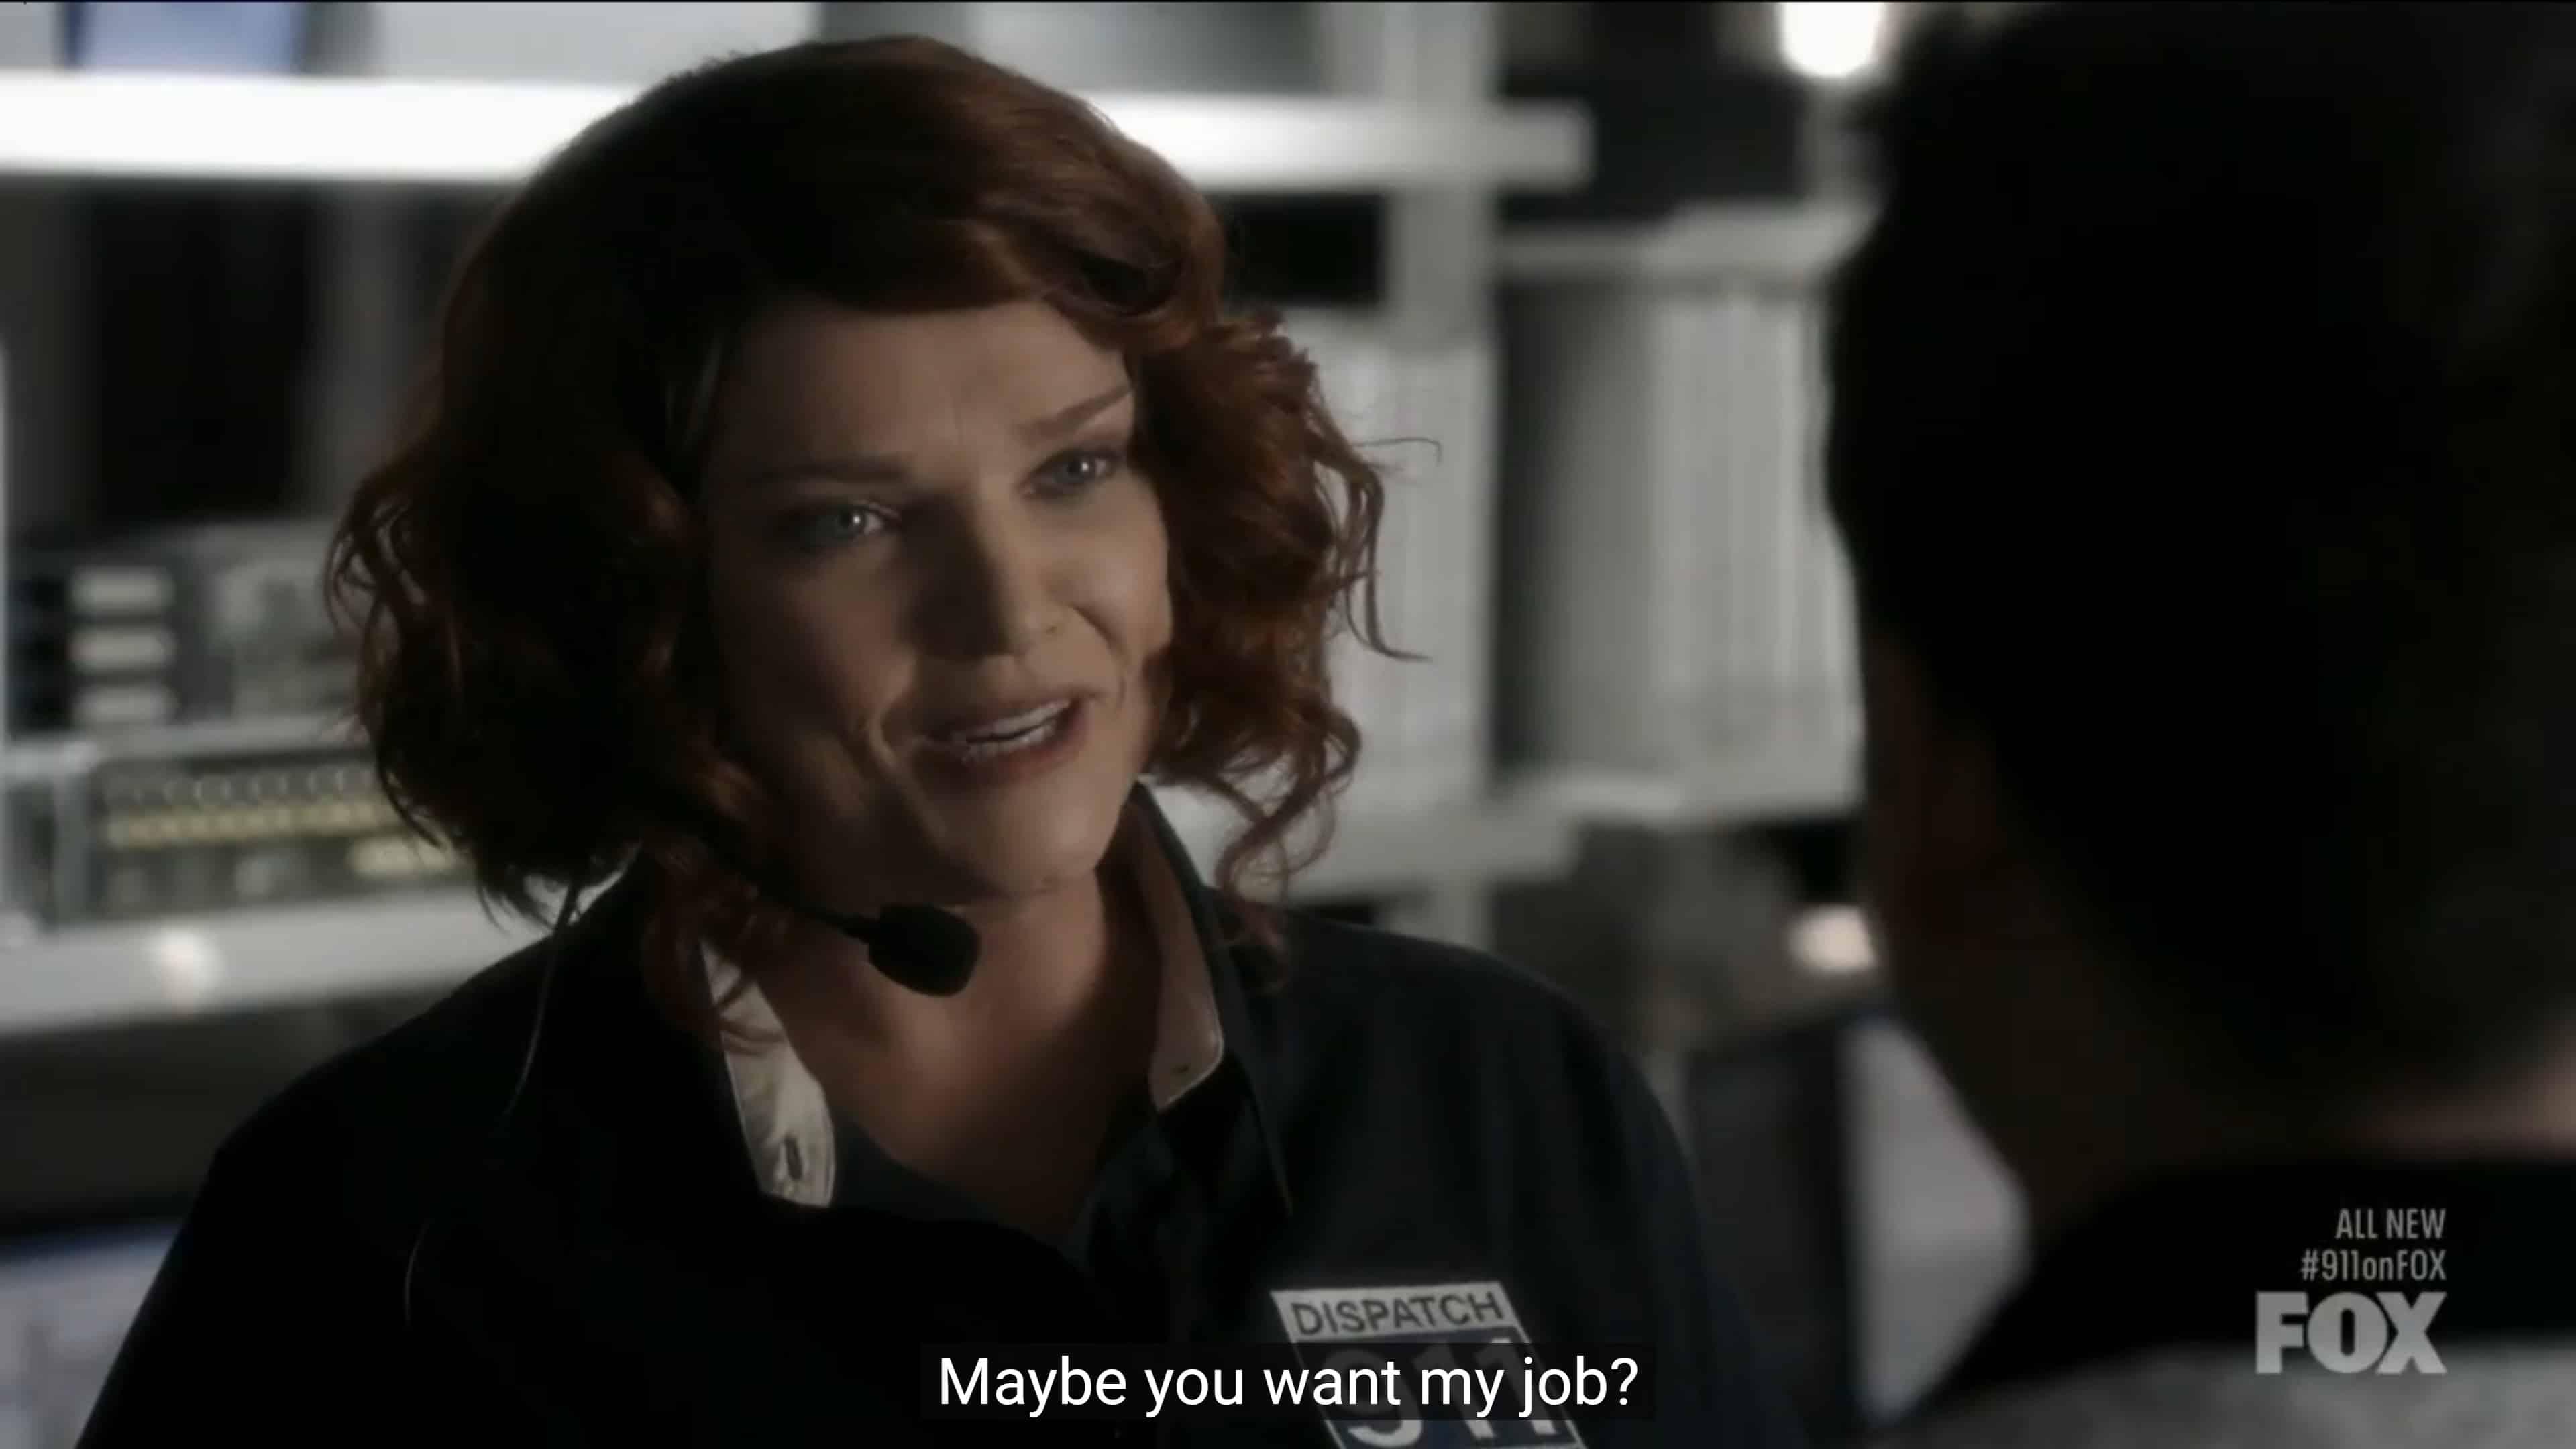 Sue offering Josh a job